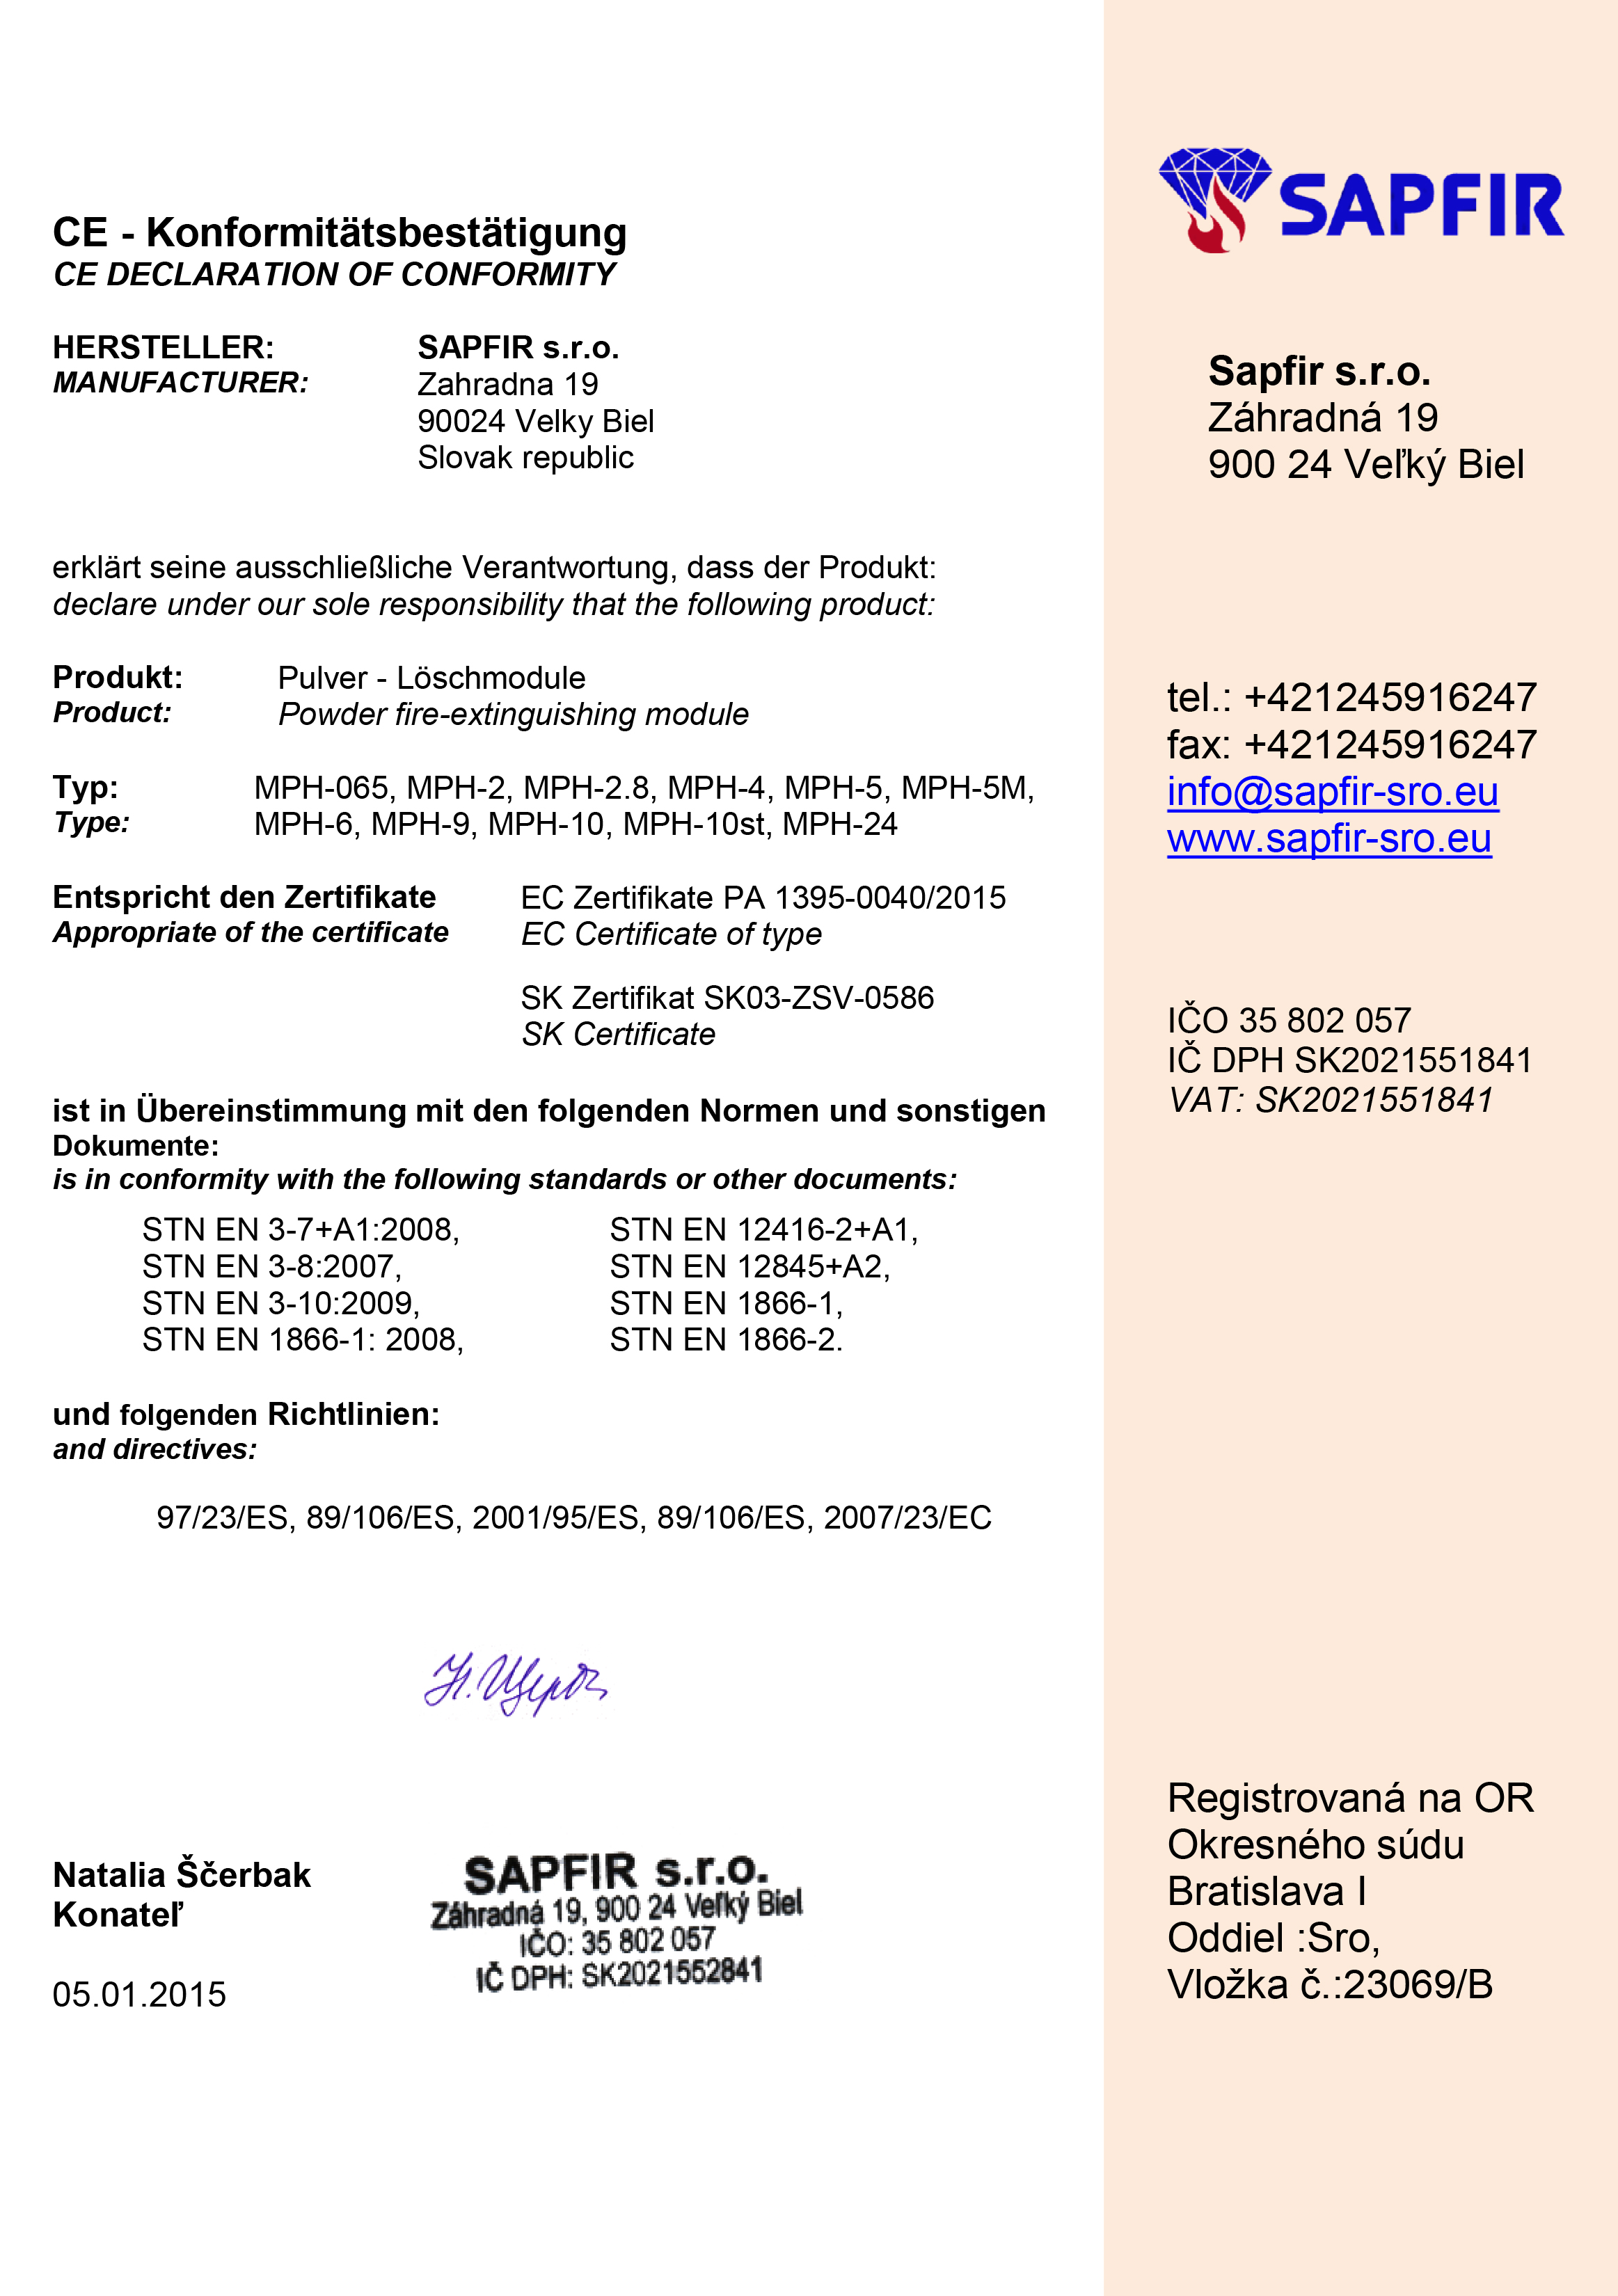 CE Komformitätsbestätigung Pulver-Löschmoduie